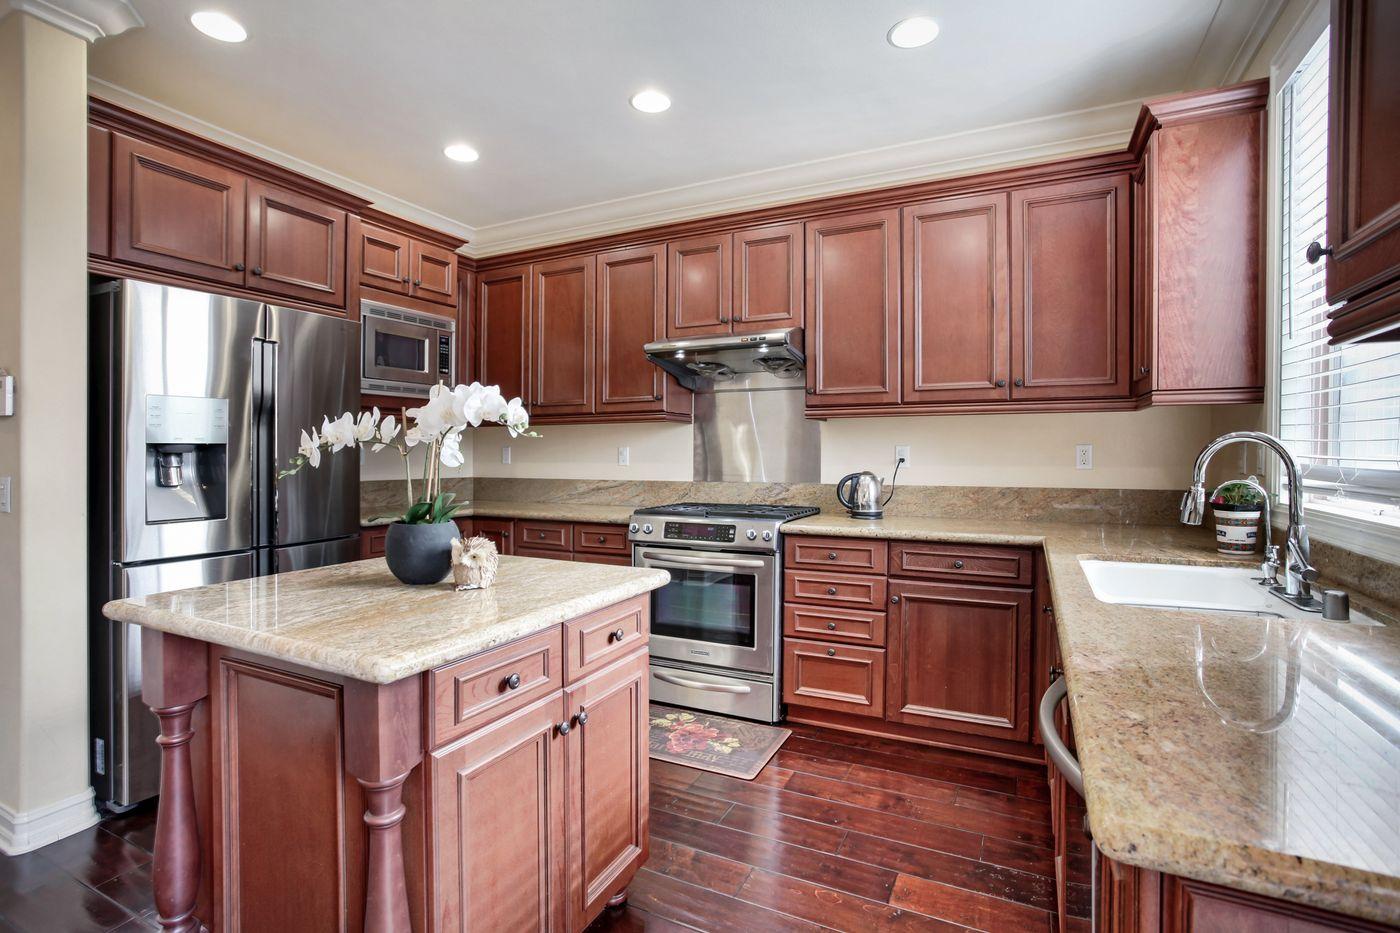 real-estate-photography-los-angeles-pasadena-glendale-burbank-5015 Farago Ave-Temple City-photographer-11